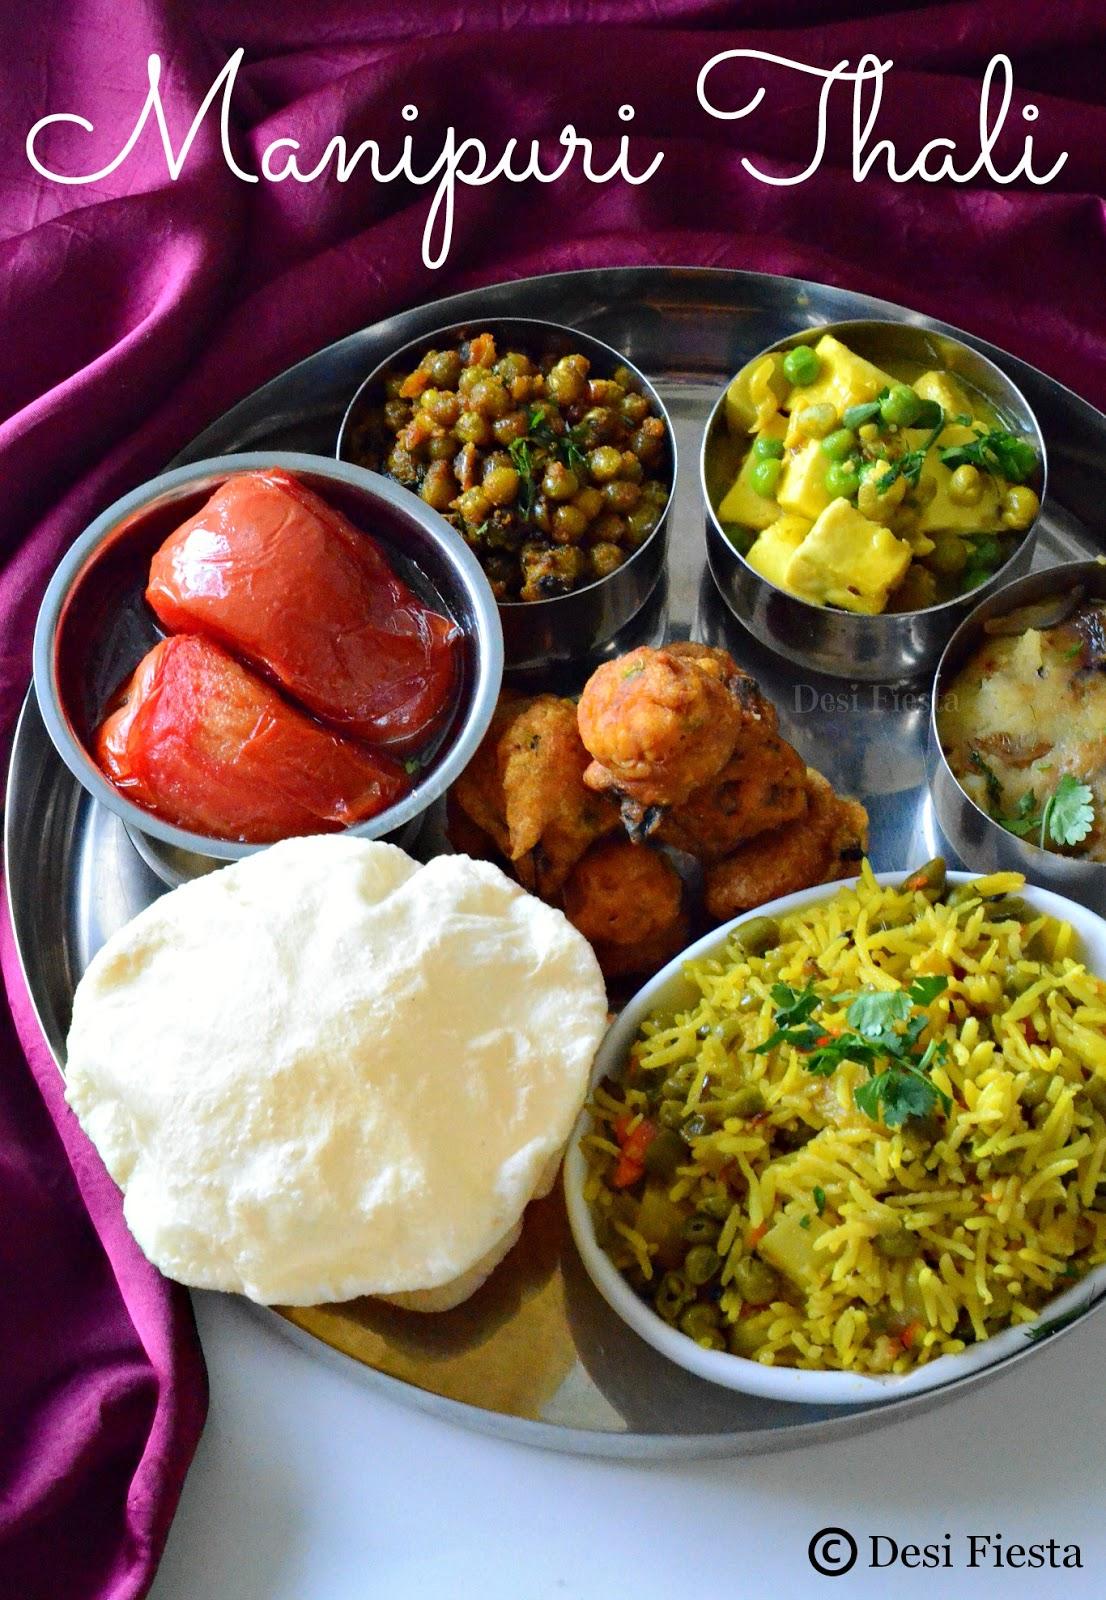 Manipuri thali manipur cuisine desi fiesta forumfinder Image collections